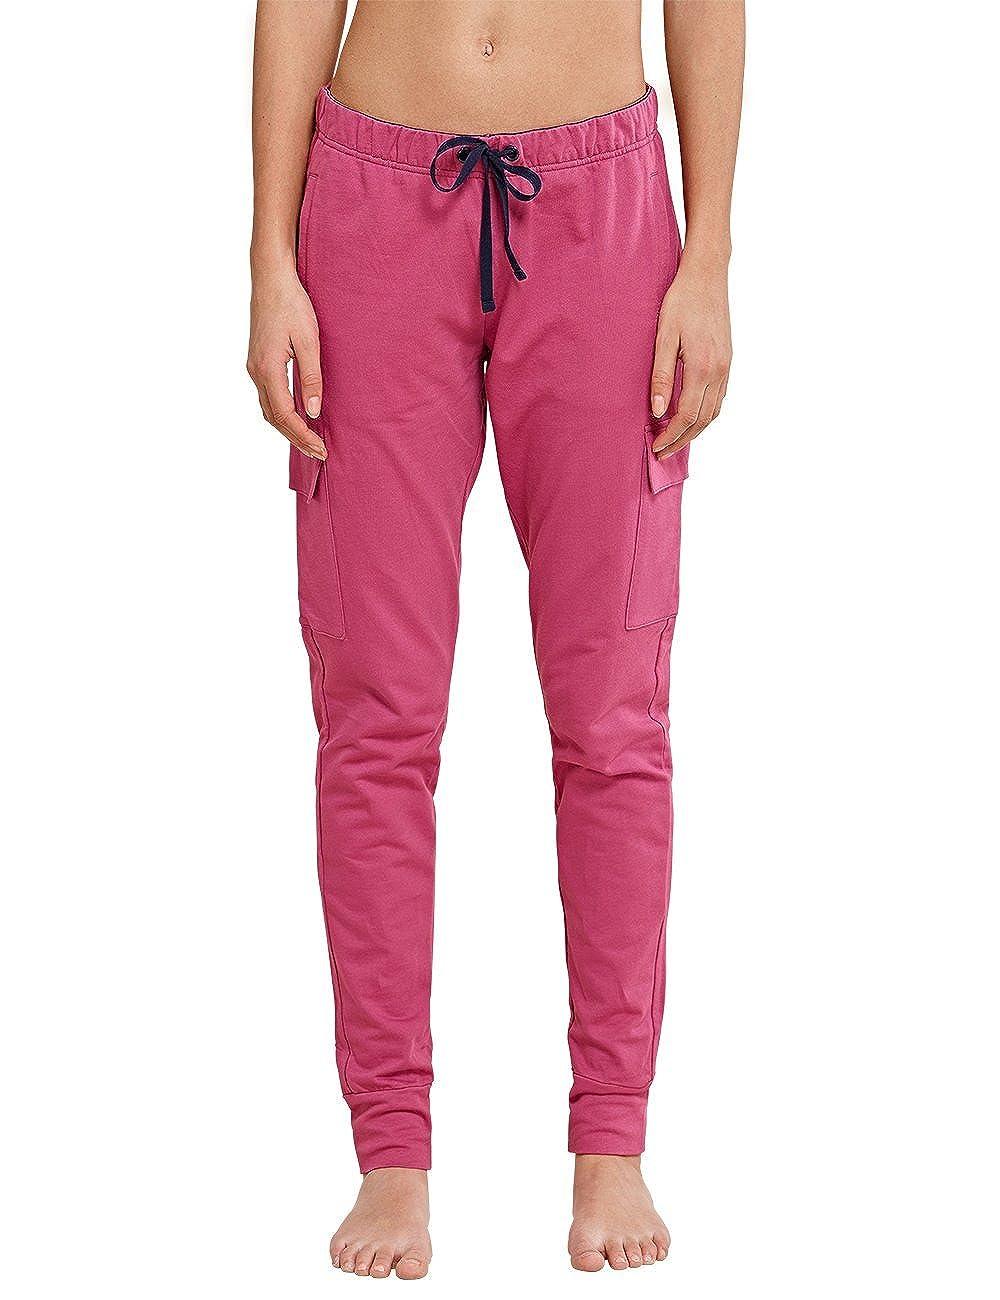 Schiesser Uncover Sweat Pants Parte Inferior del Pijama para Mujer